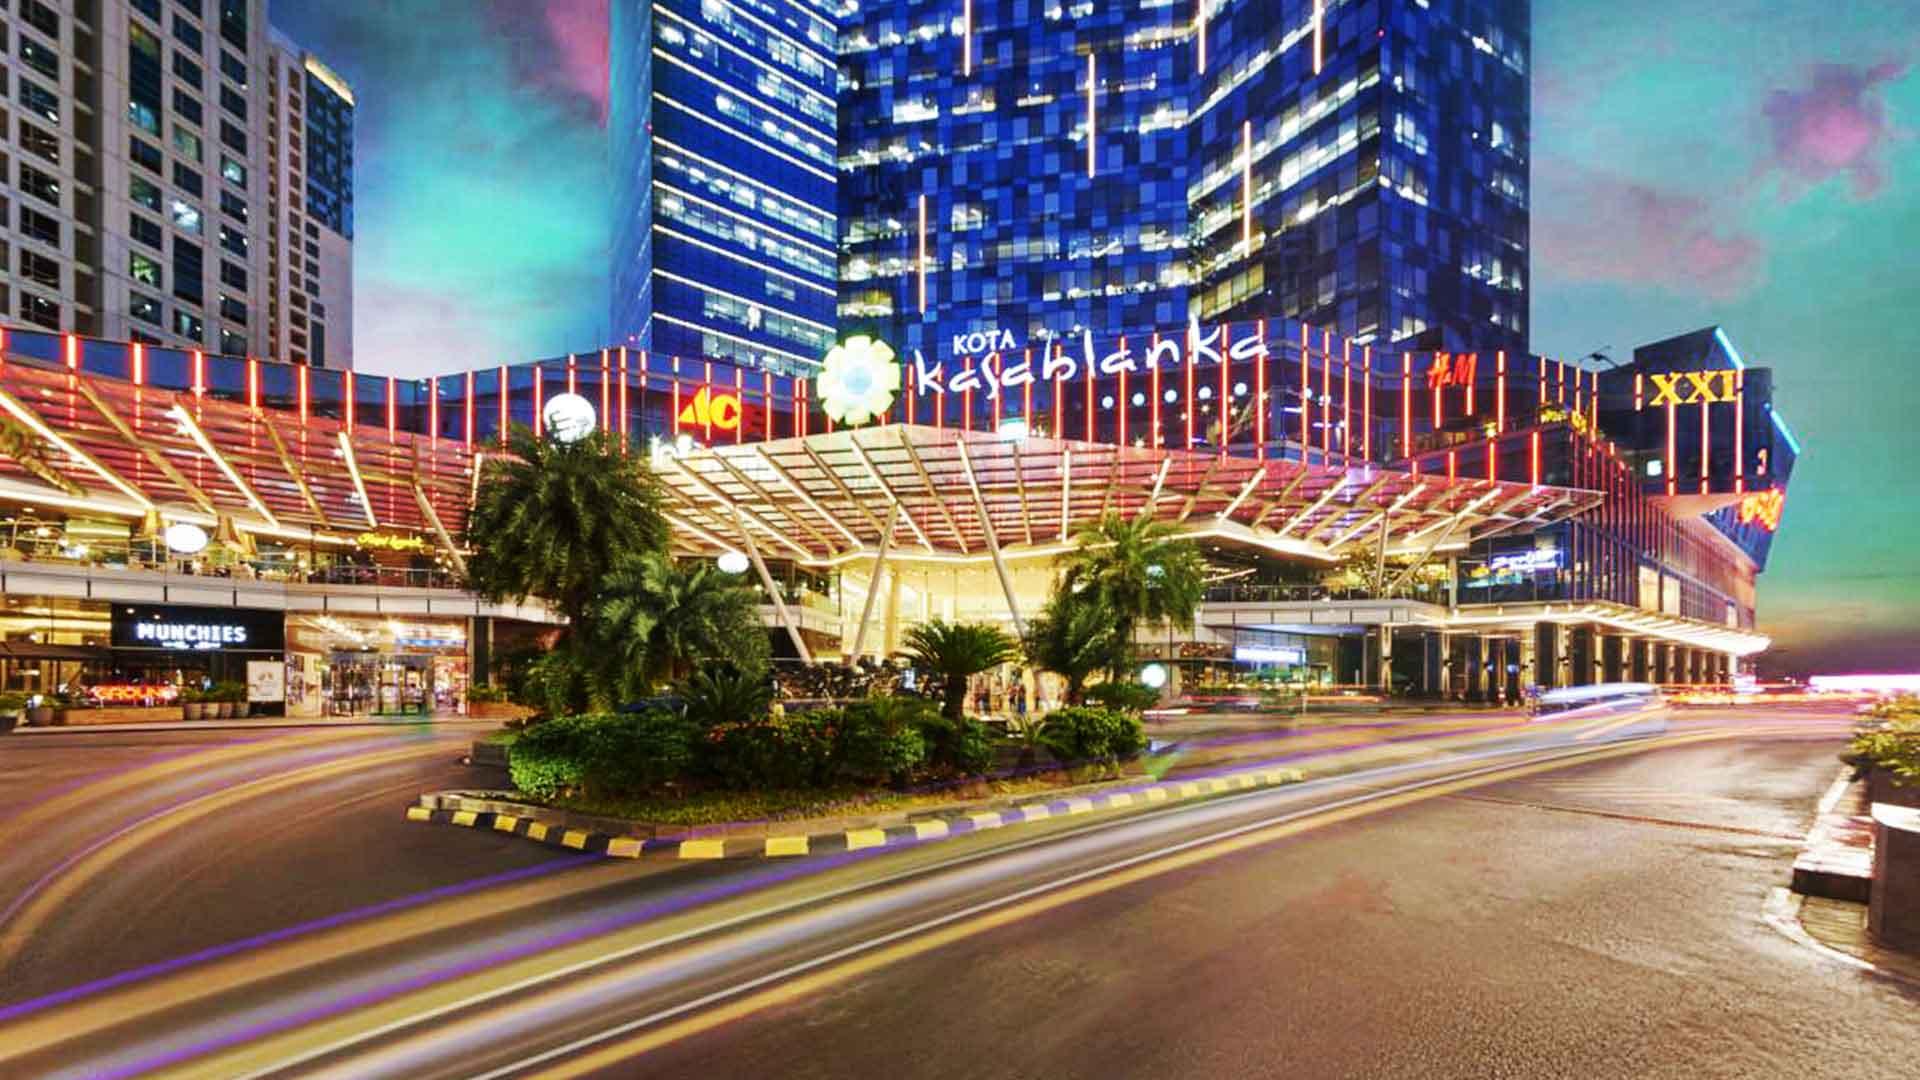 Kota Kasablanka Mall   Pakuwon Jati